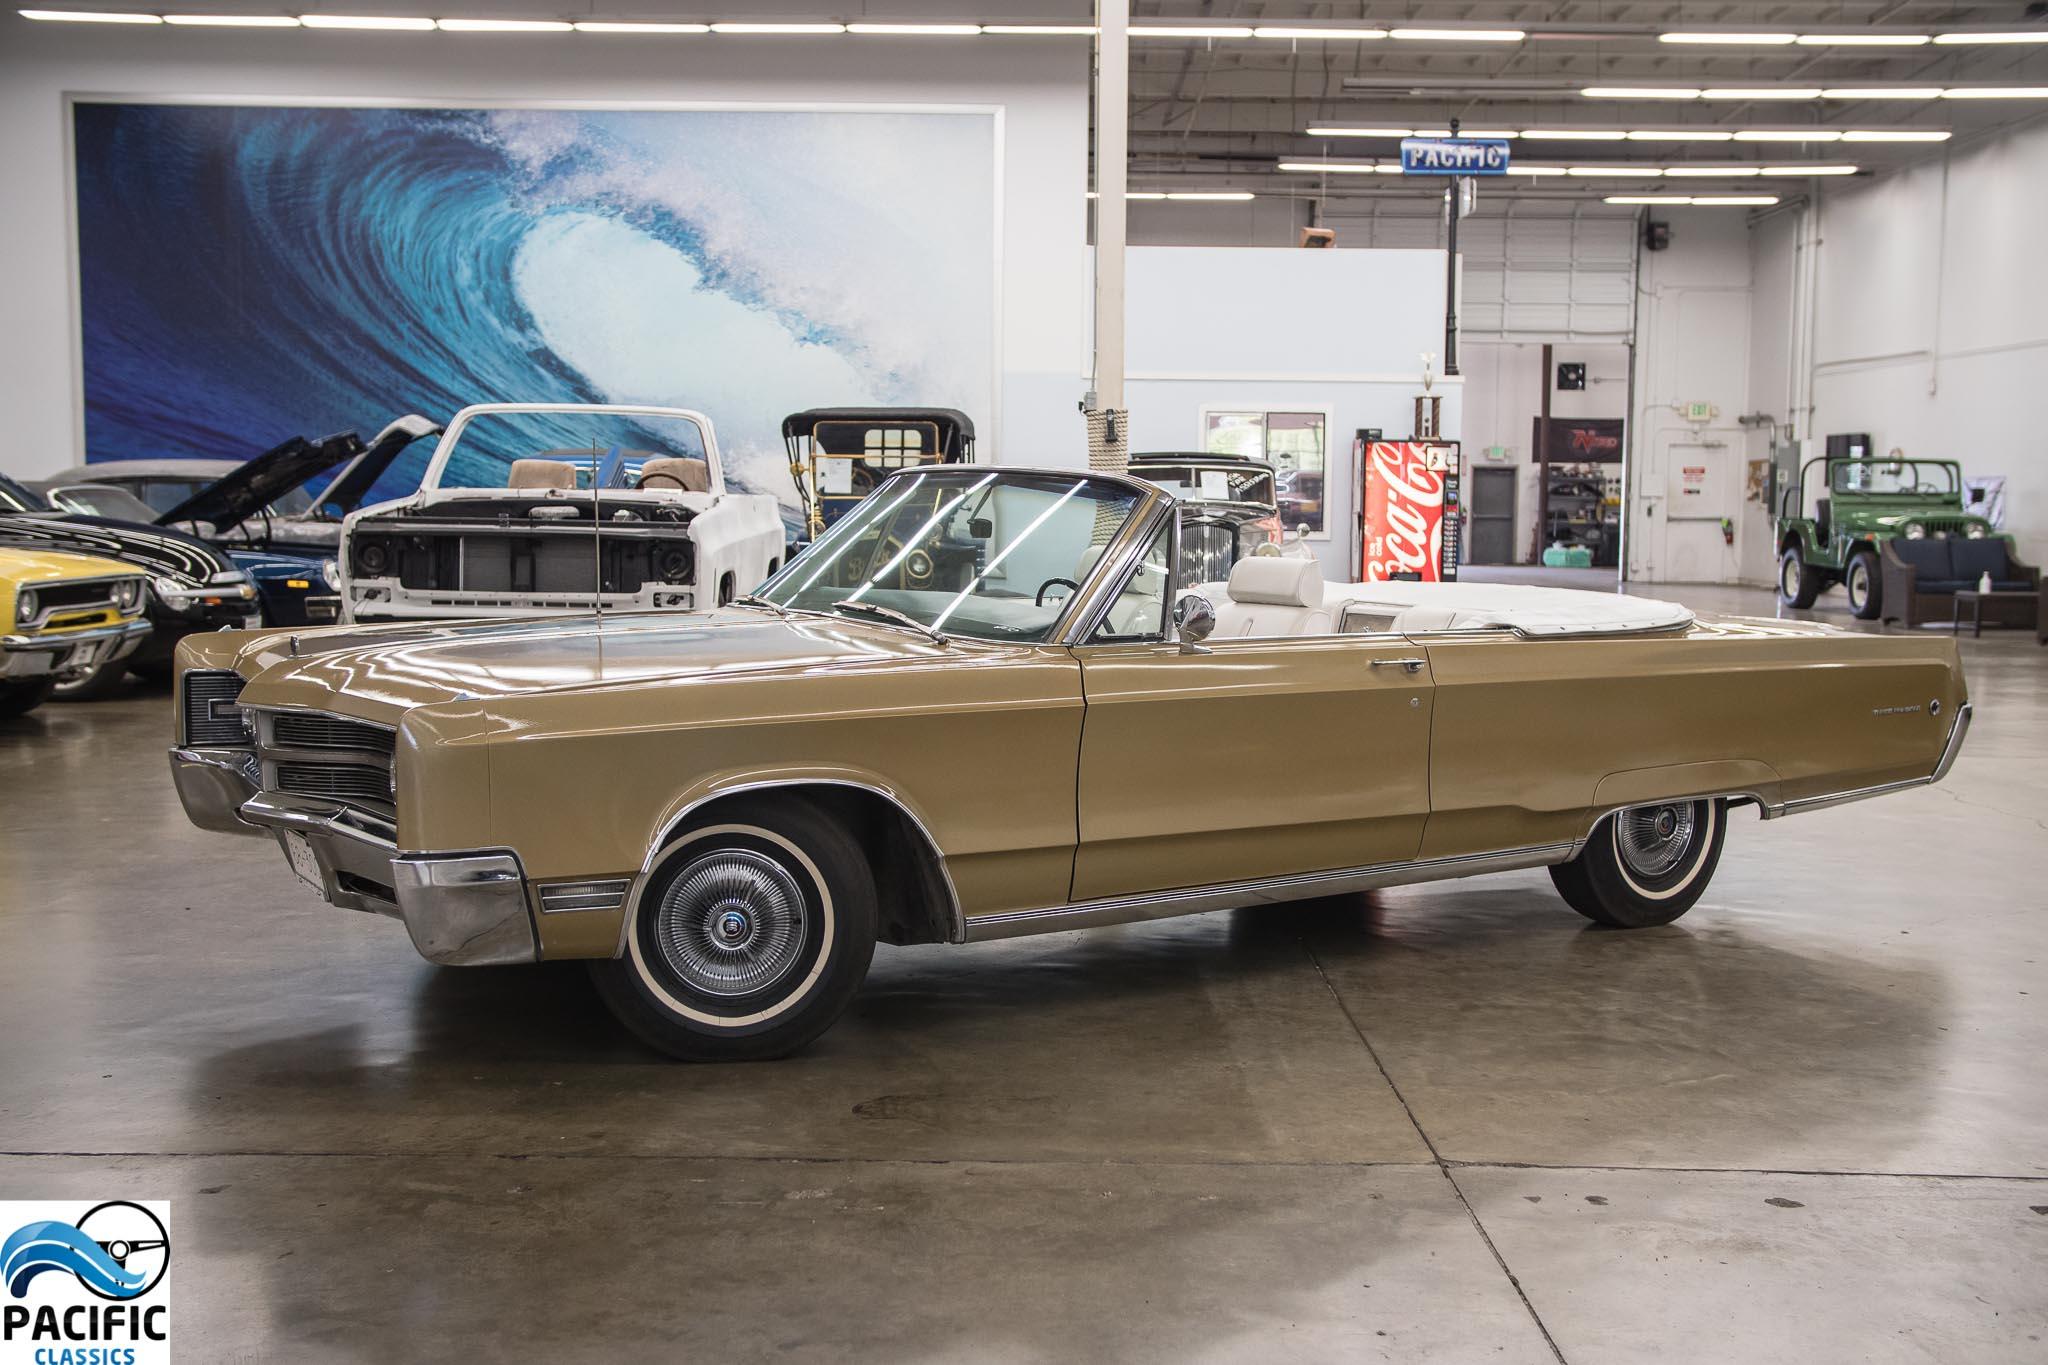 1968 Chrysler 300 Convertible